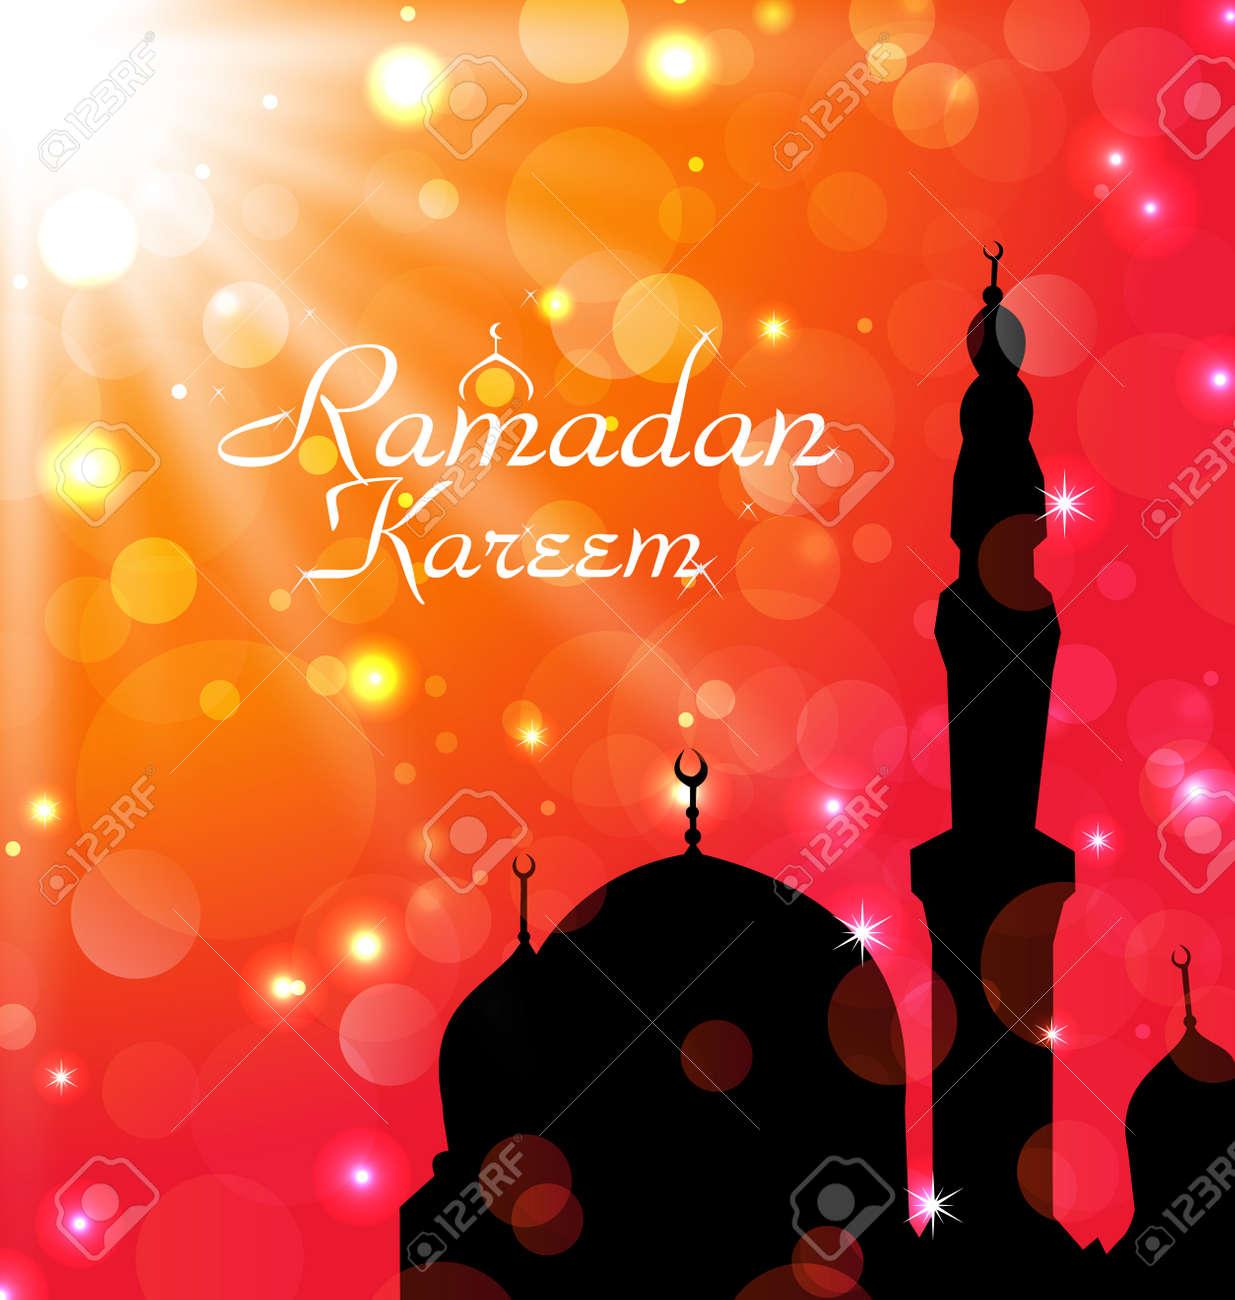 Illustration celebration card for Ramadan Kareem - vector Stock Illustration - 20137649